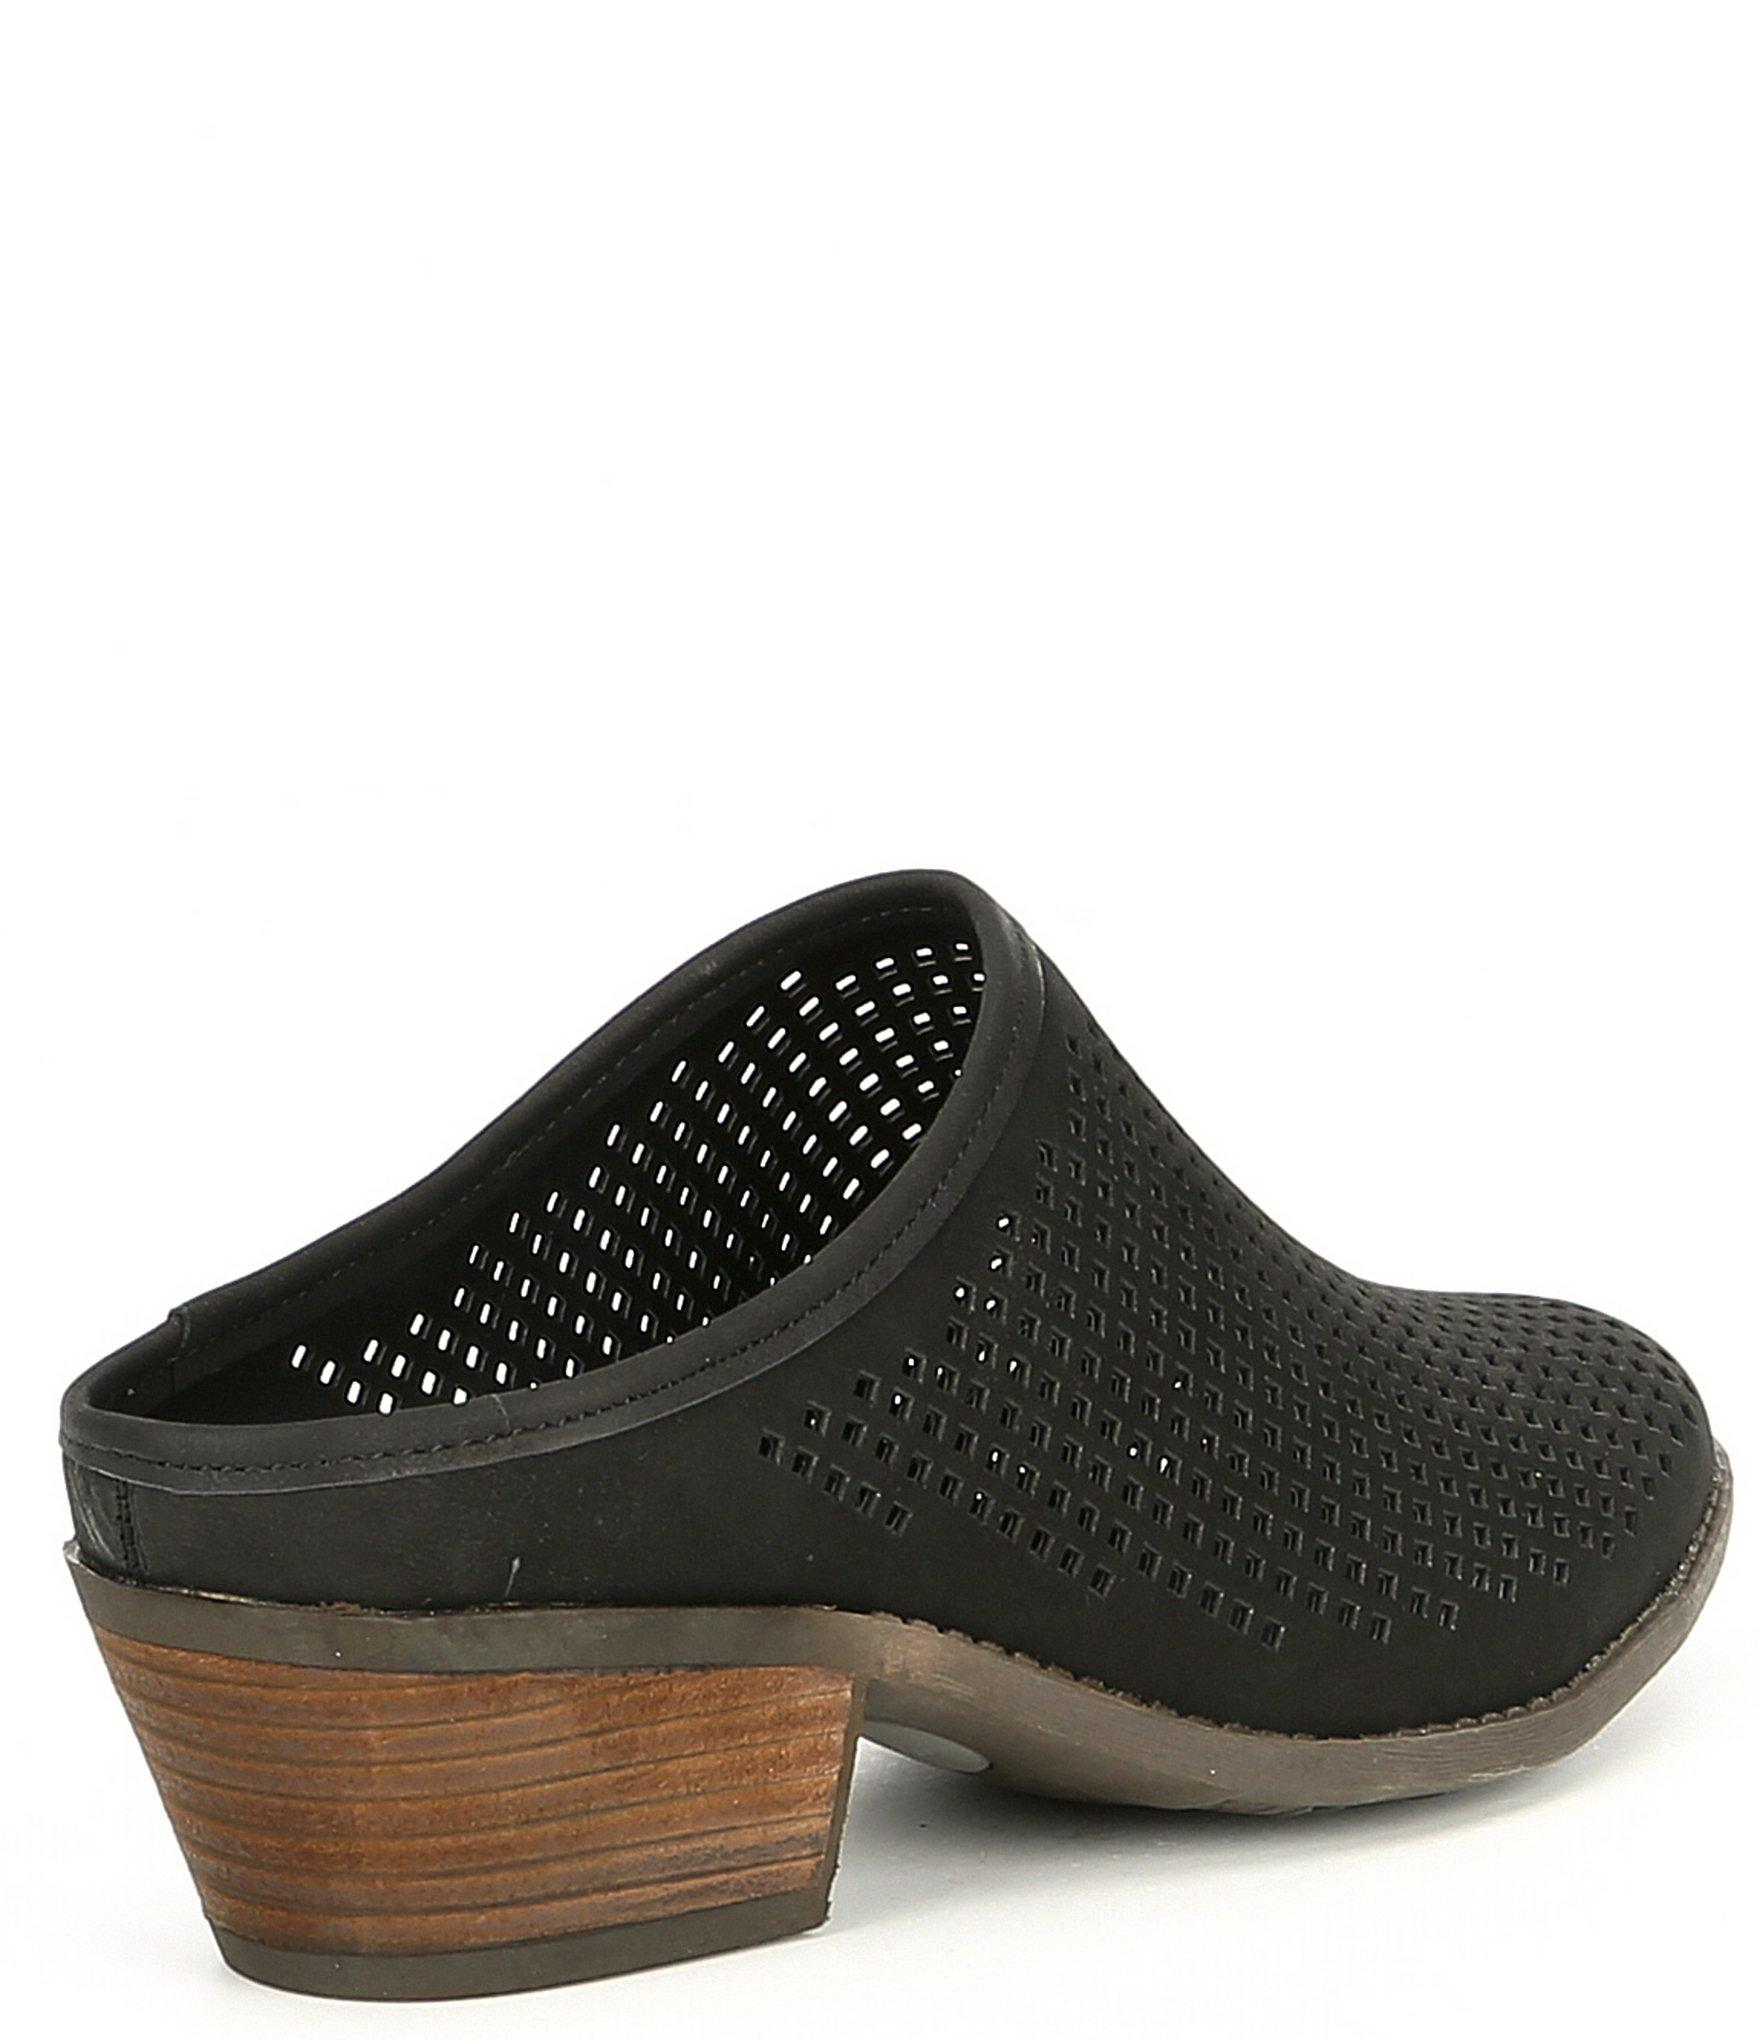 3bc4b5b4 Me Too By Adam Tucker Zara Nubuck Perforated Block Heel Mules in ...